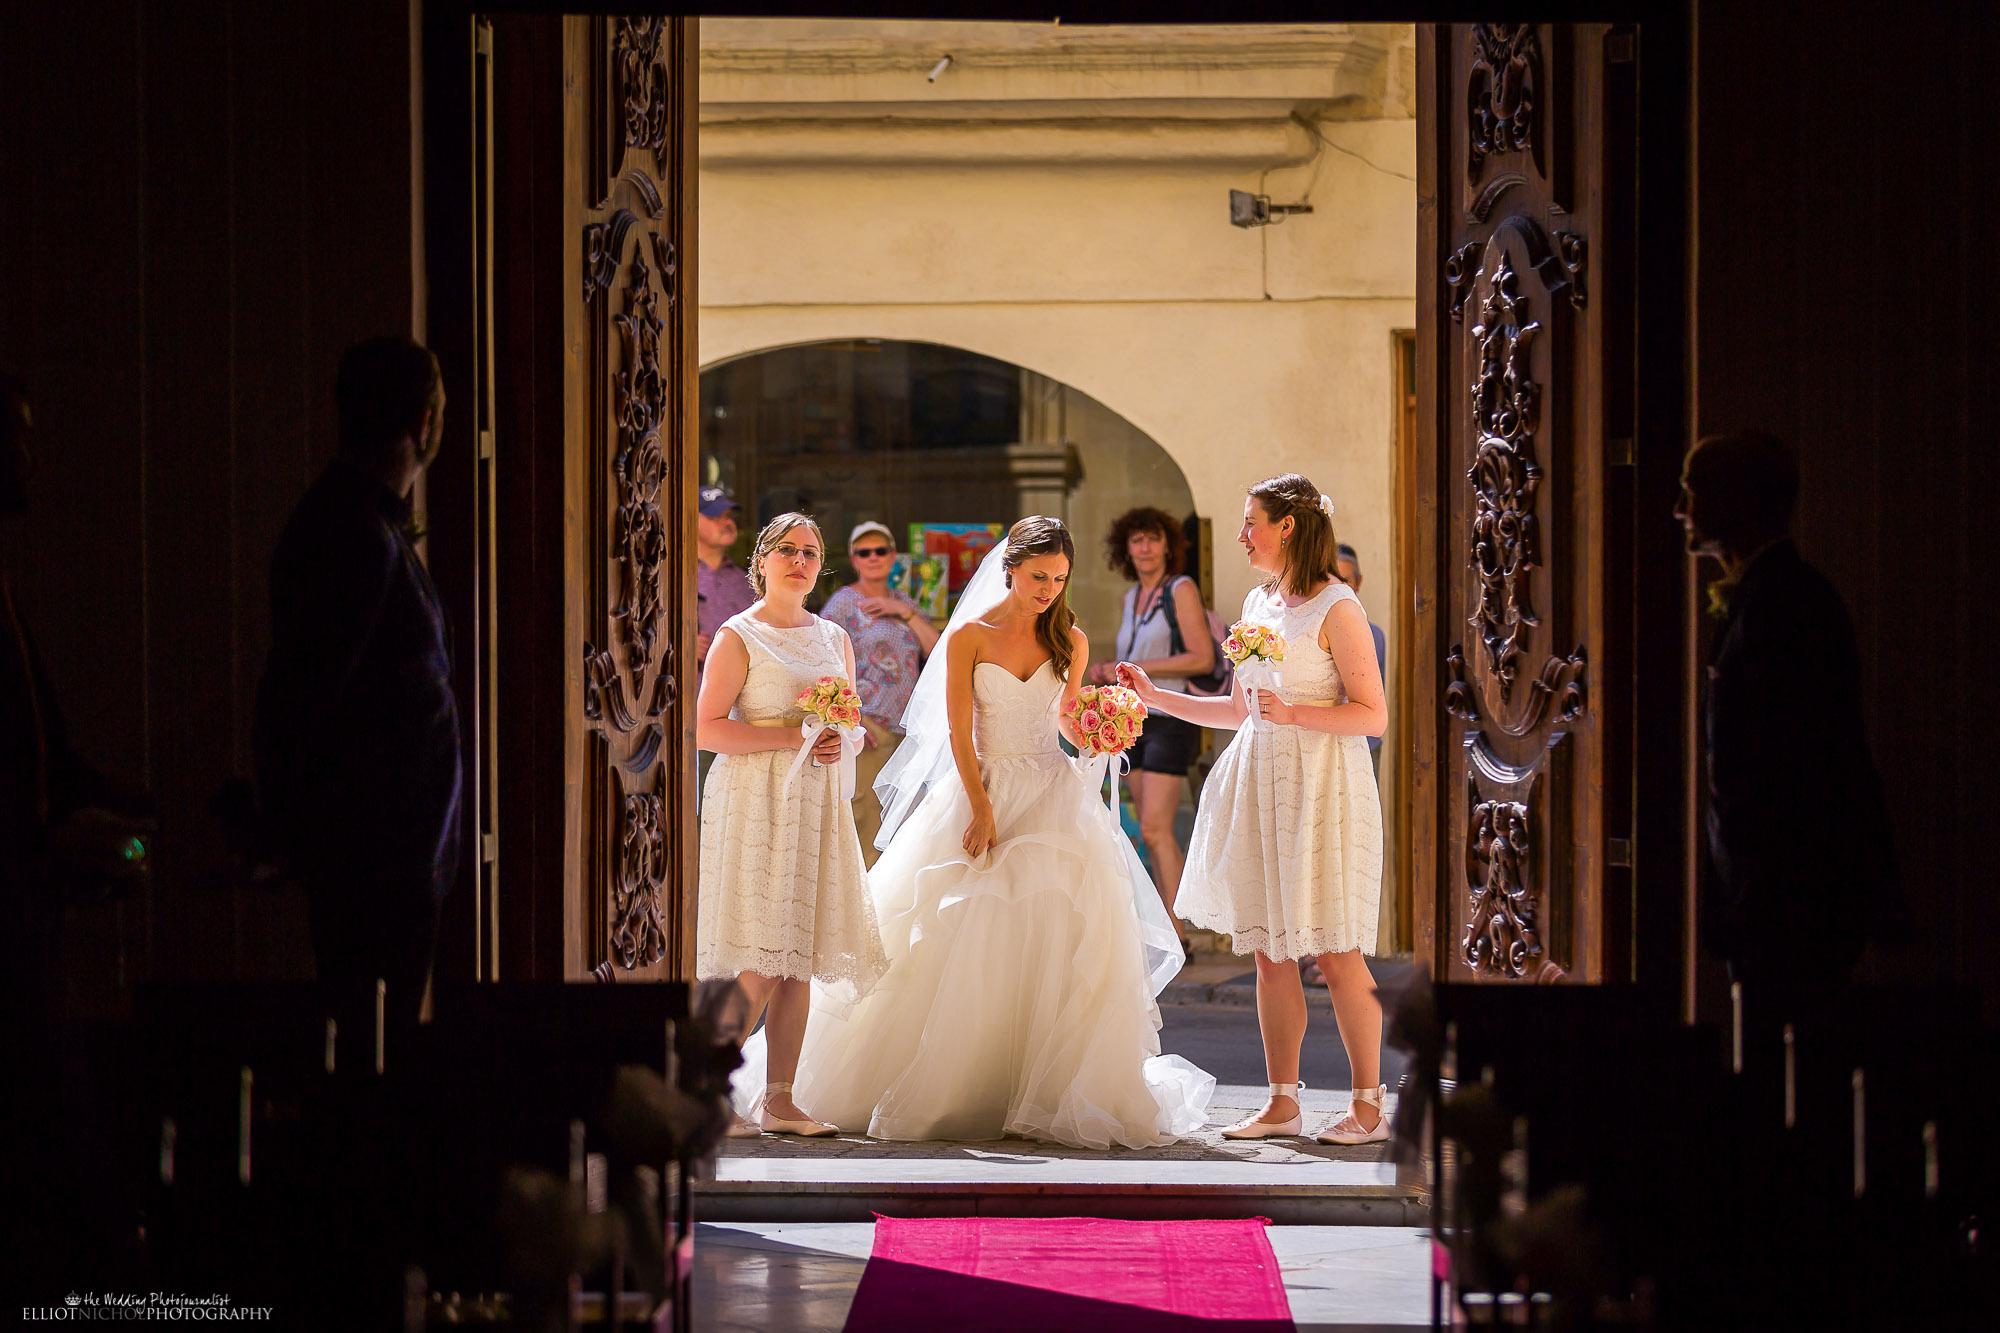 bride-bridesmaids-church-procession-destination-wedding-photography